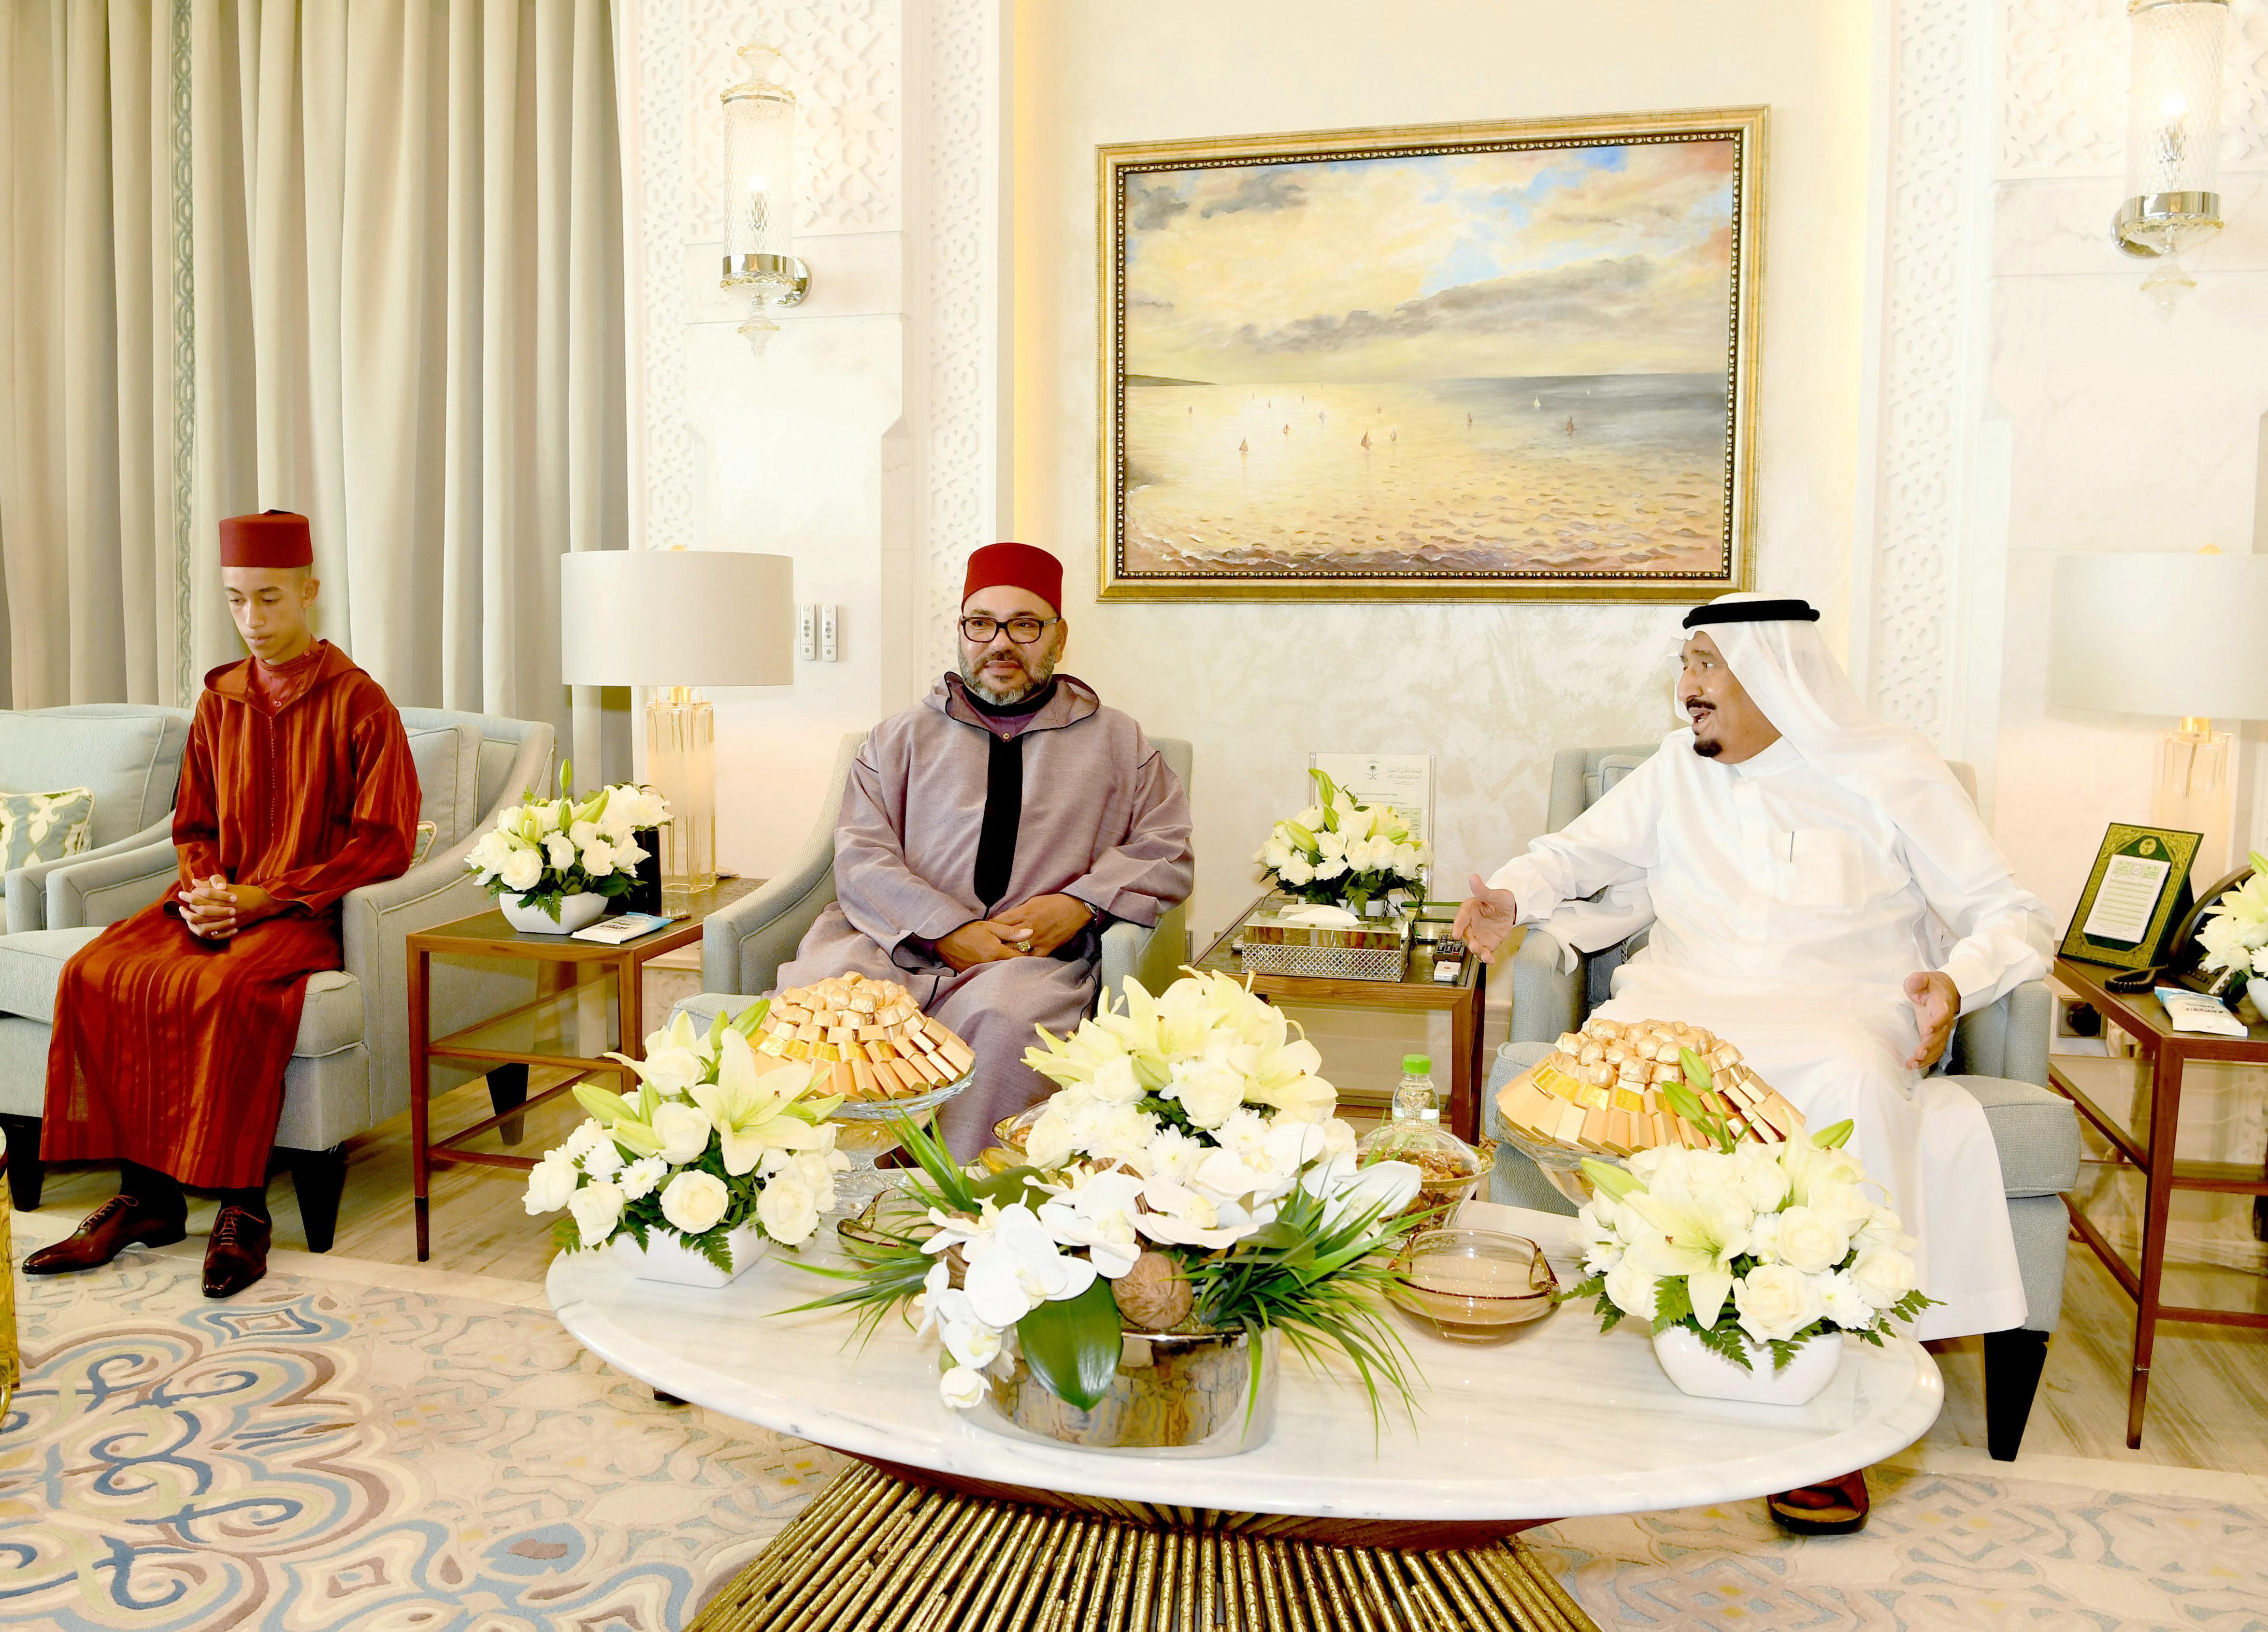 Le roi Salman d'Arabie saoudite appelle le roi Mohammed